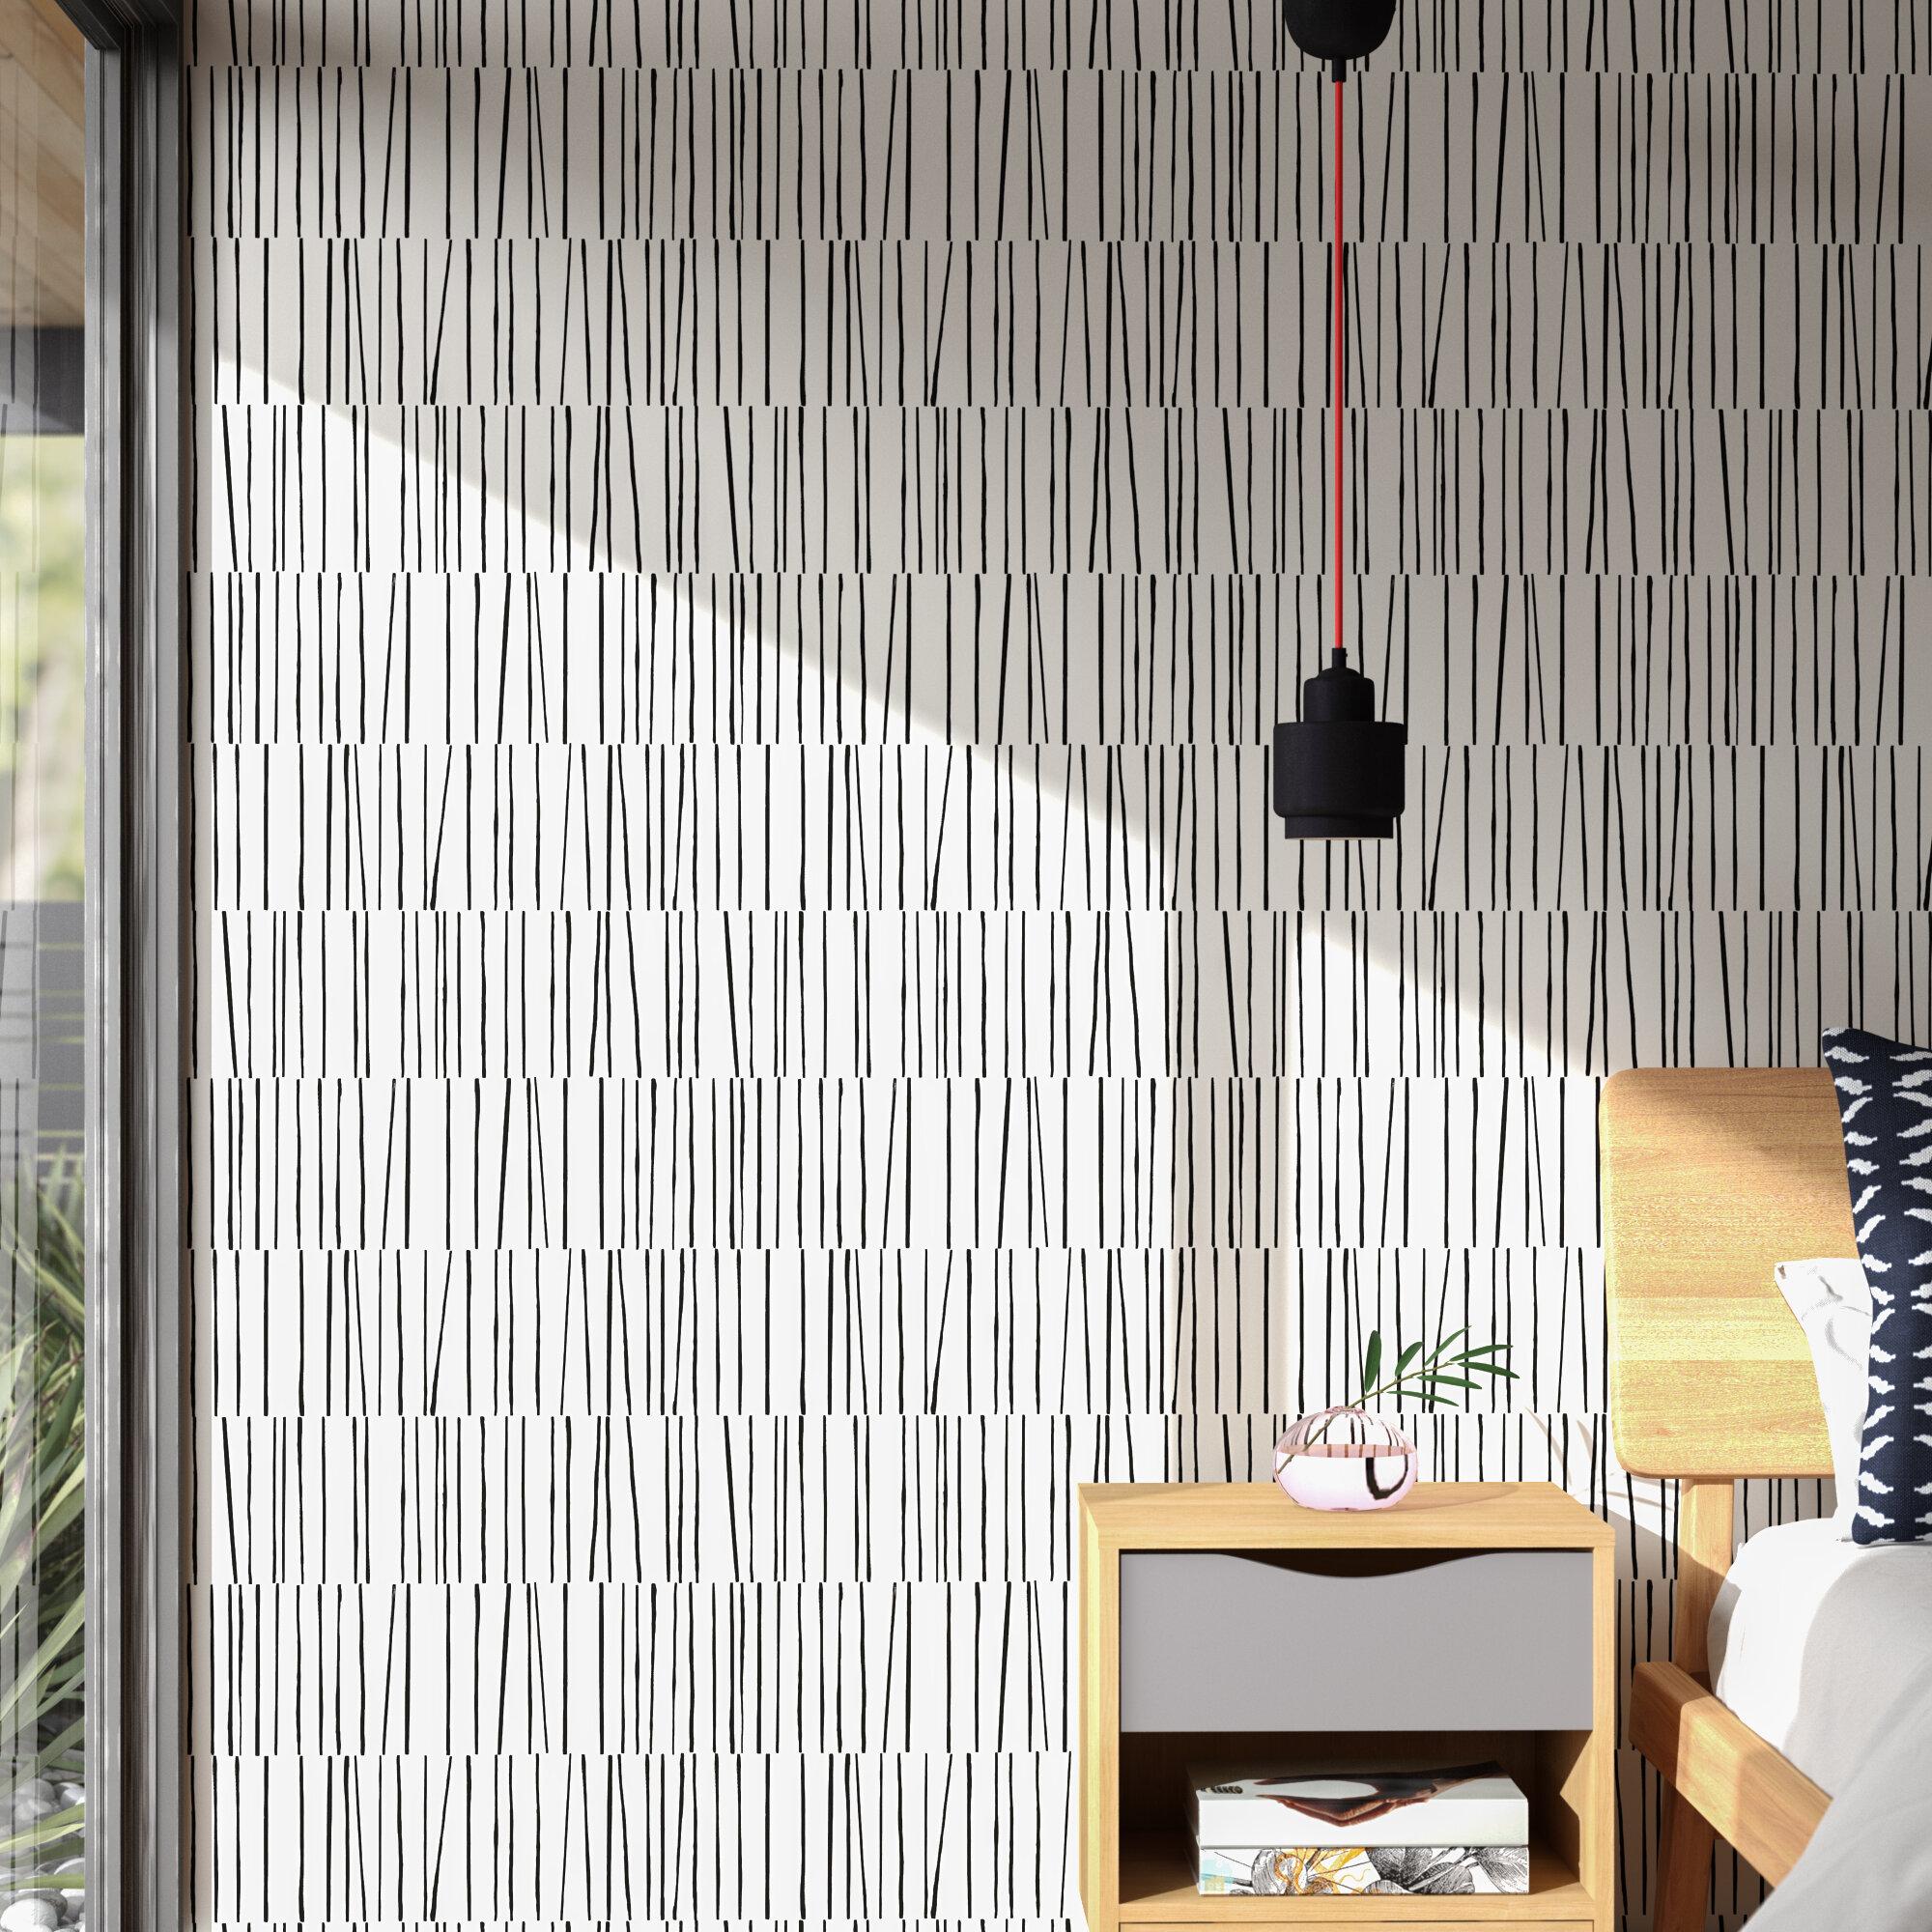 abena shift 33 l x 20 5 w peel and stick wallpaper roll reviews allmodern abena shift 33 l x 20 5 w peel and stick wallpaper roll